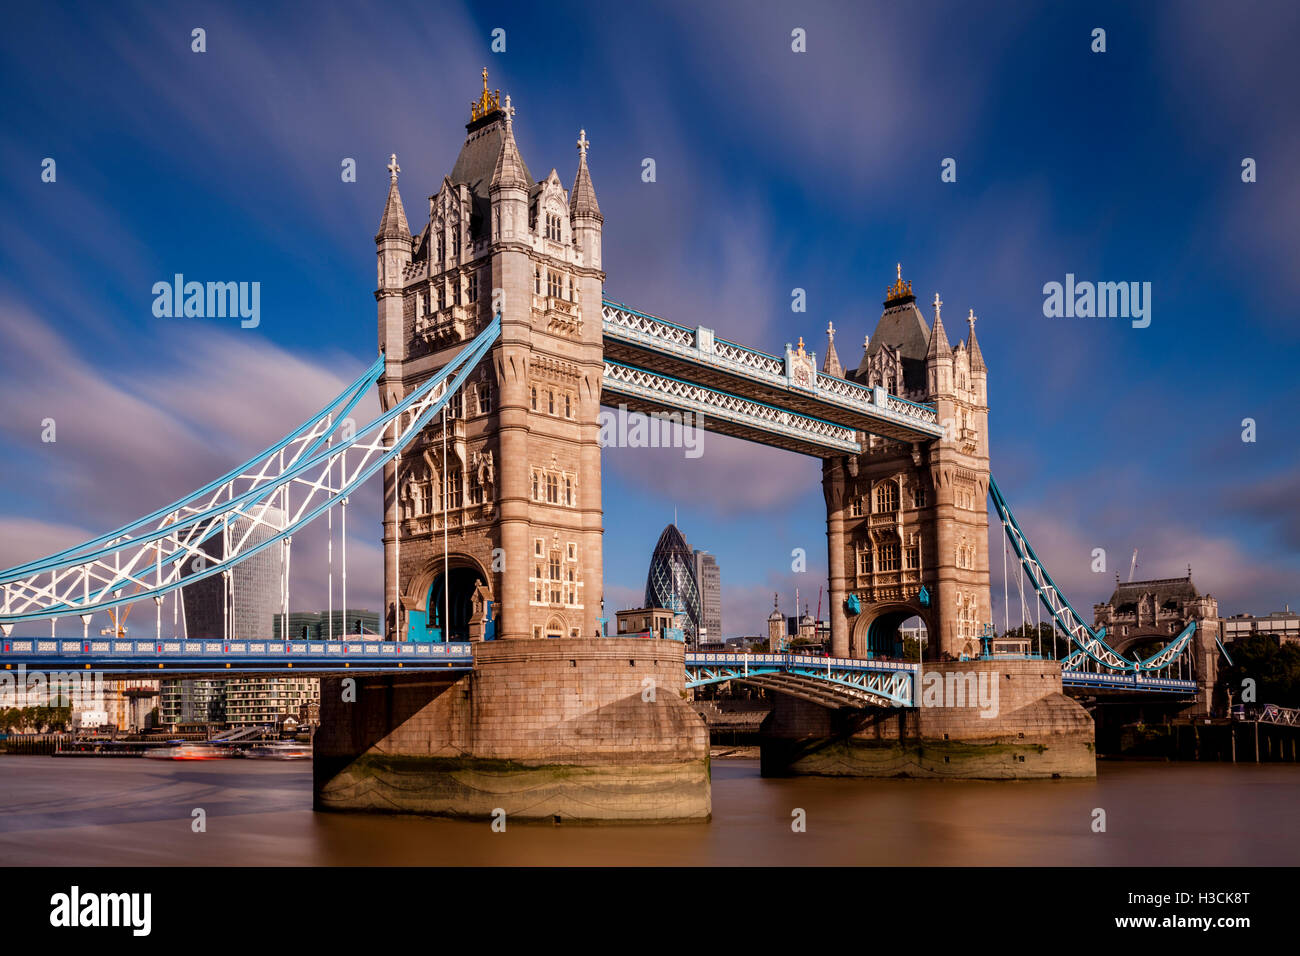 Tower Bridge and River Thames, London, England Stock Photo